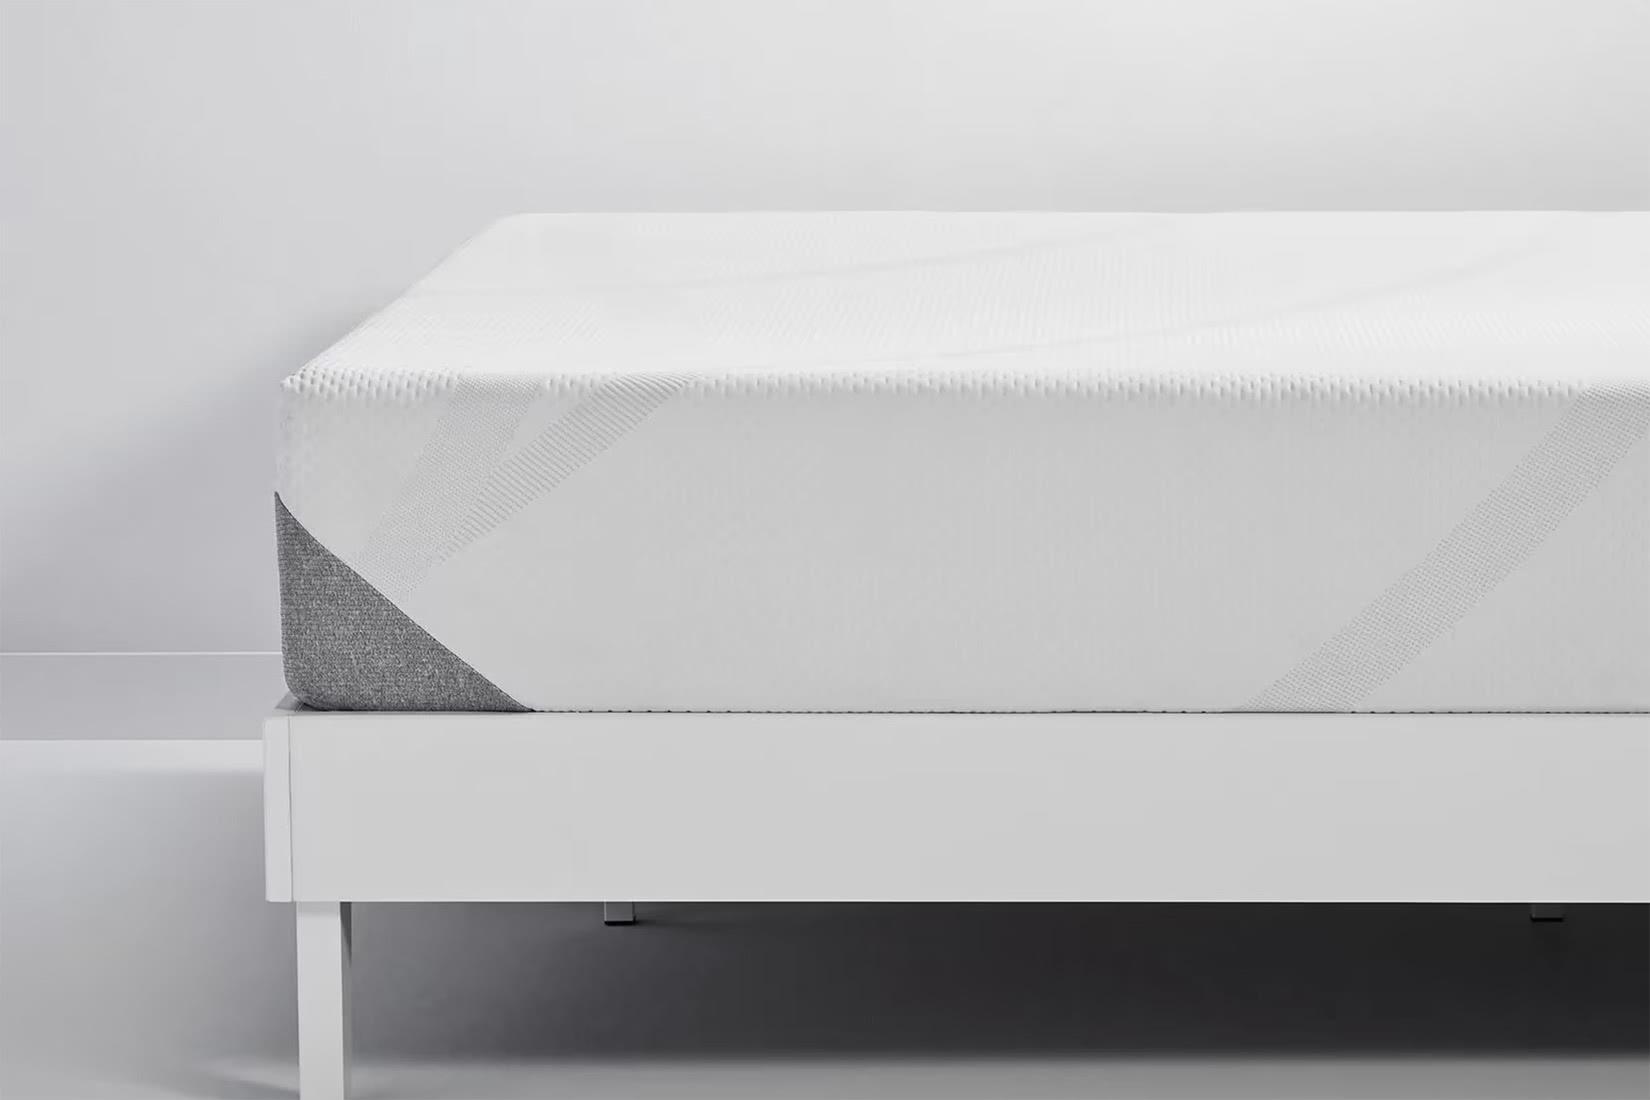 Tempur-Pedic cloud mattress layers review - Luxe Digital